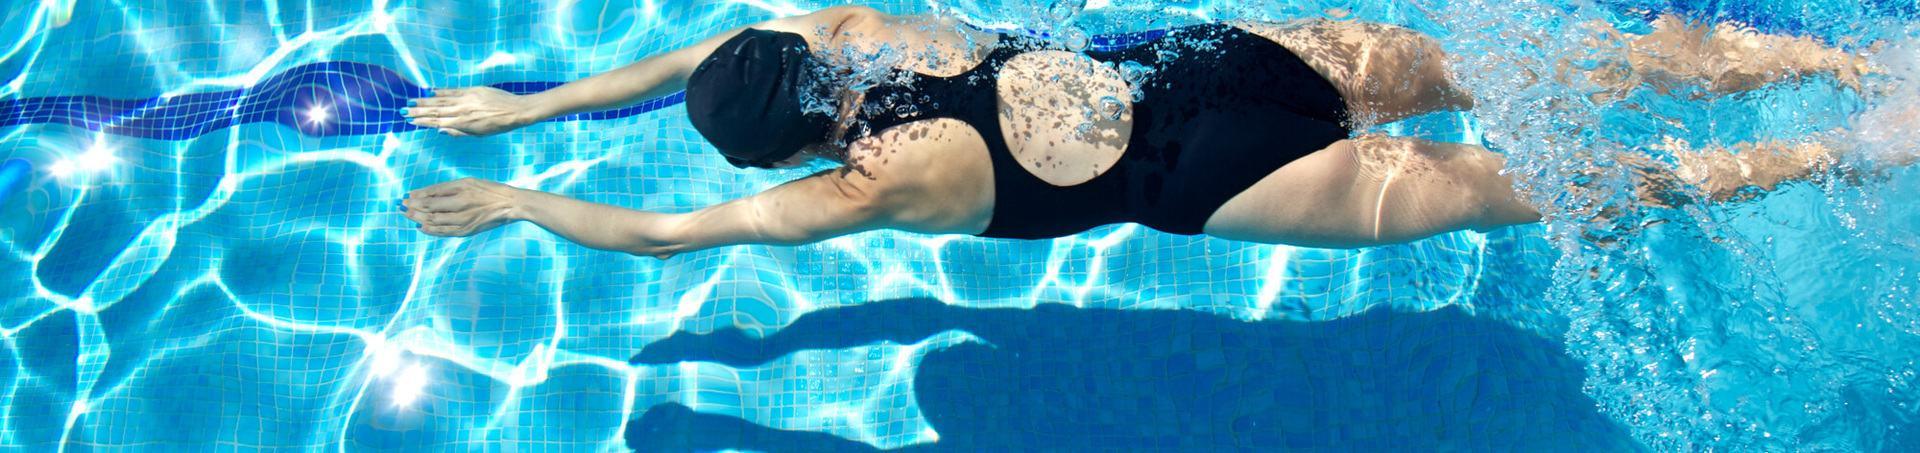 Ambiance aquinox piscine